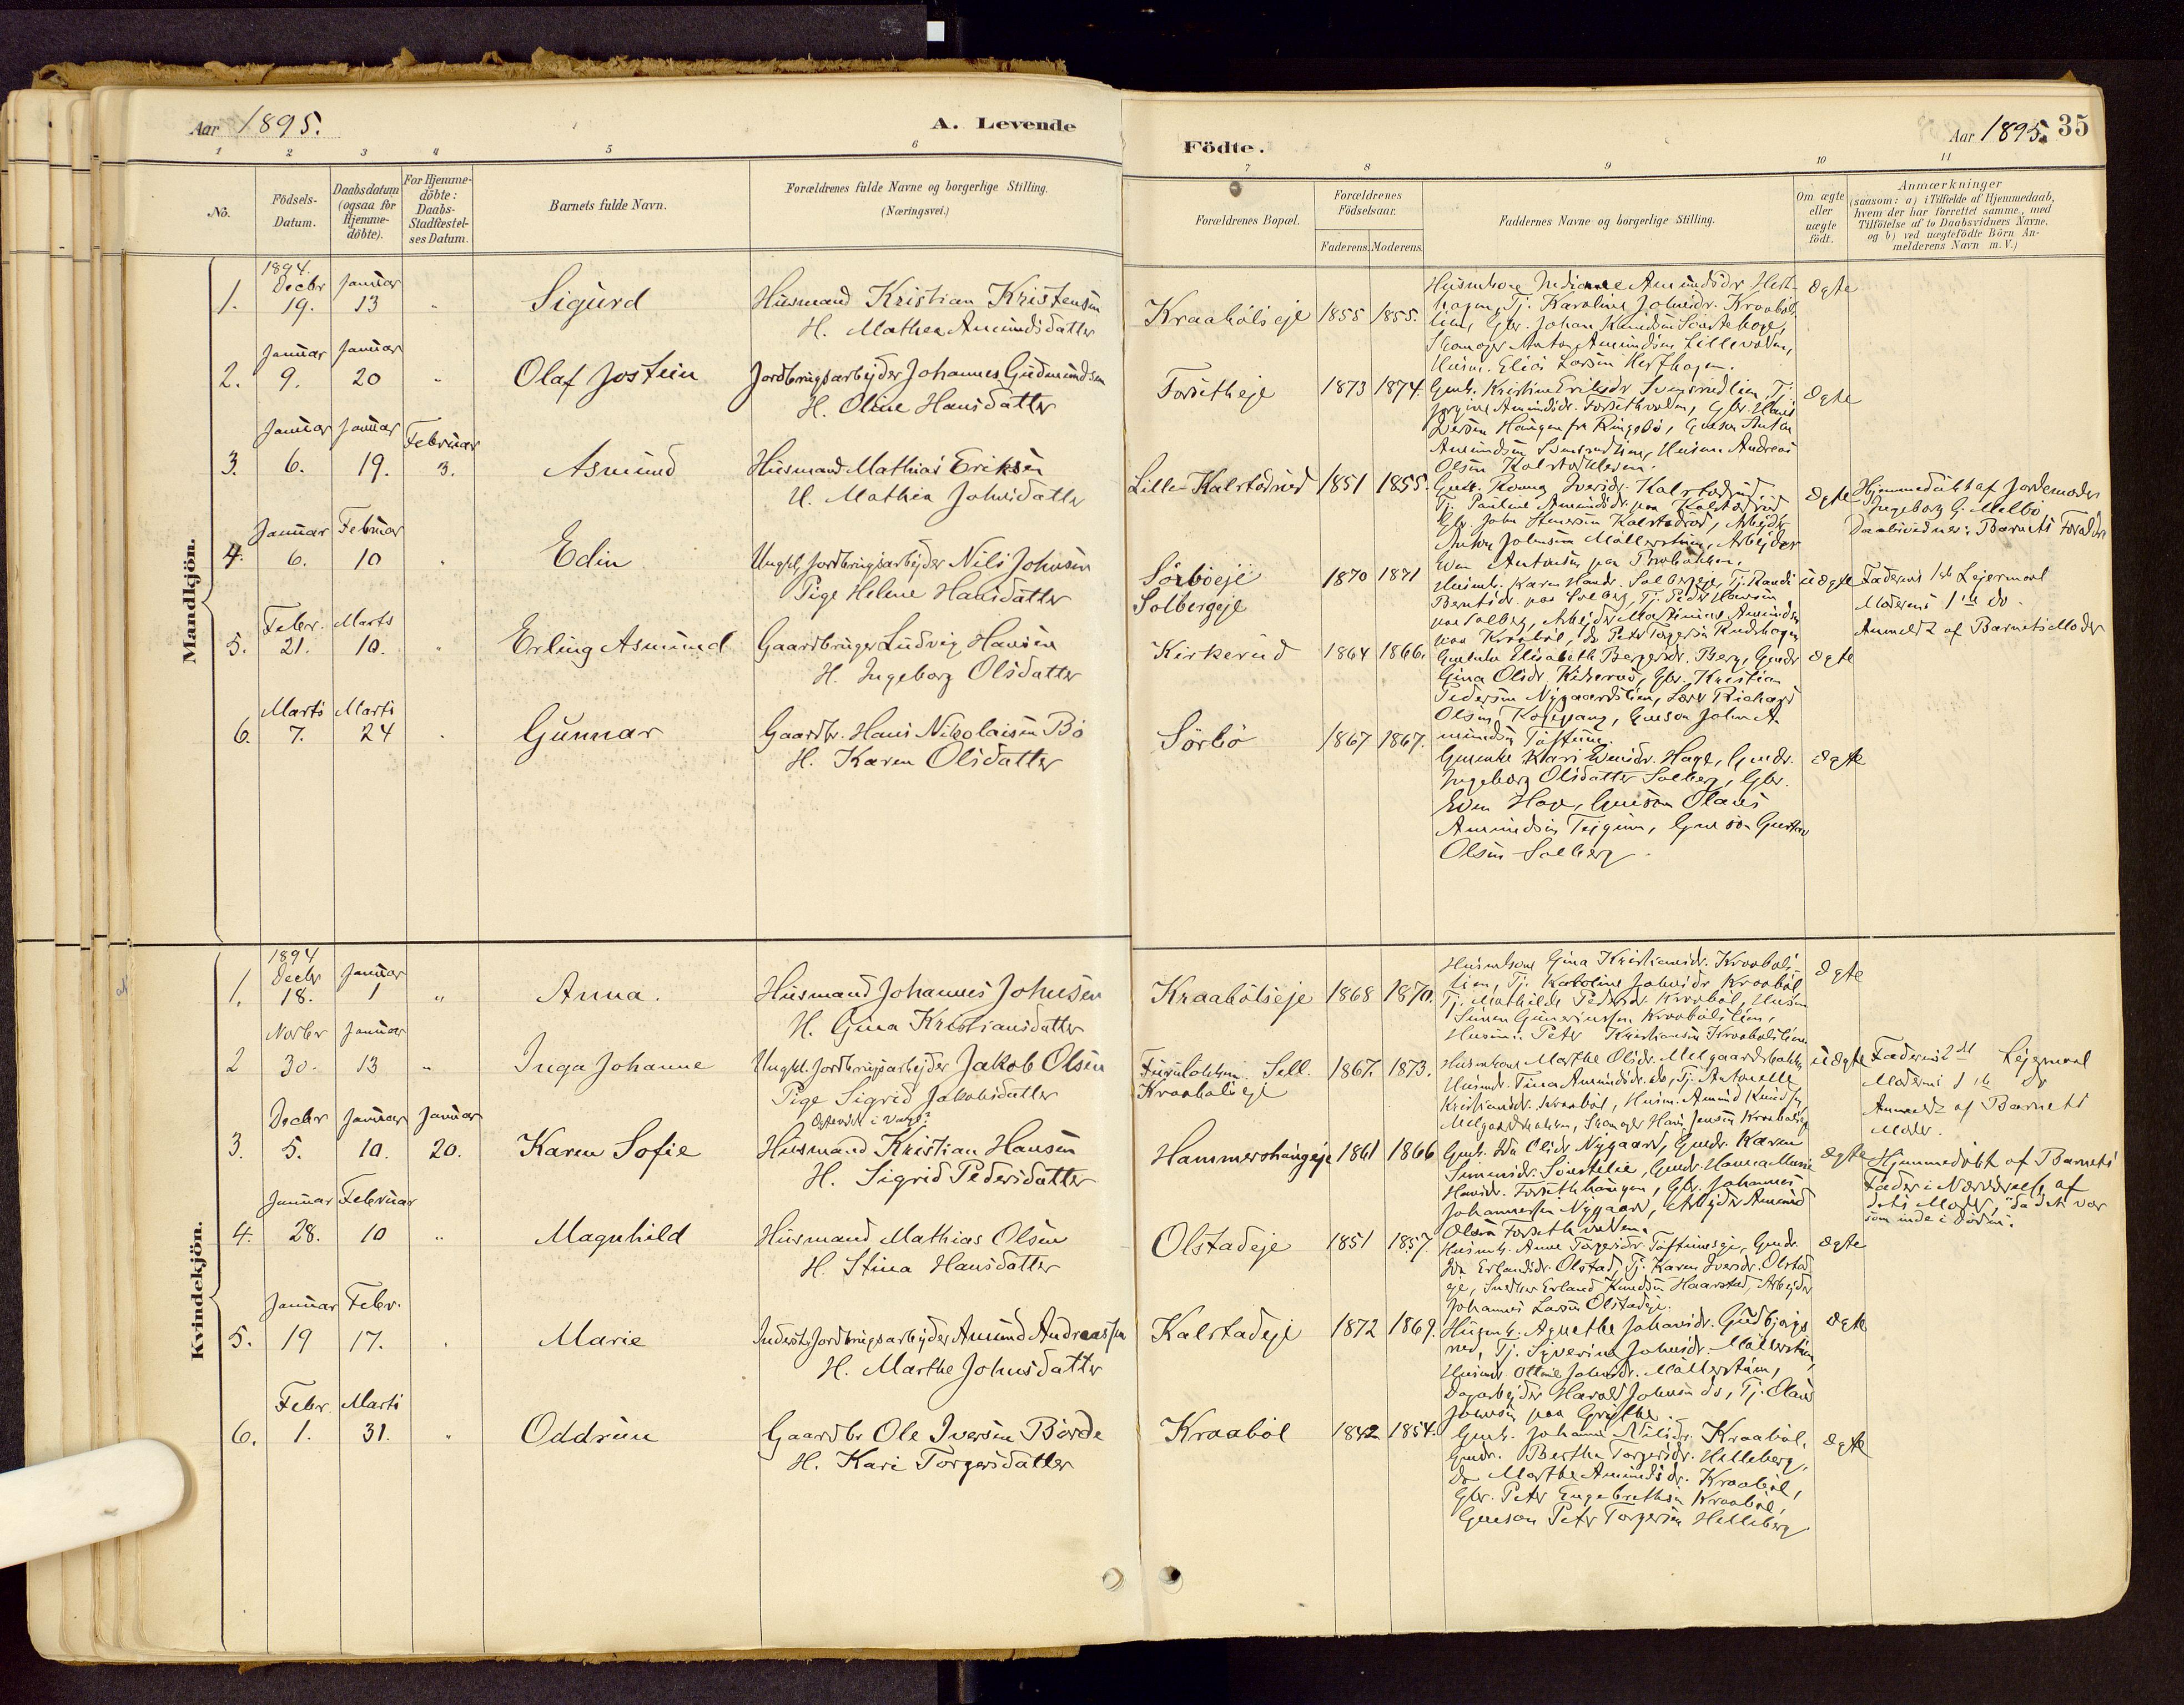 SAH, Vestre Gausdal prestekontor, Ministerialbok nr. 1, 1887-1914, s. 35